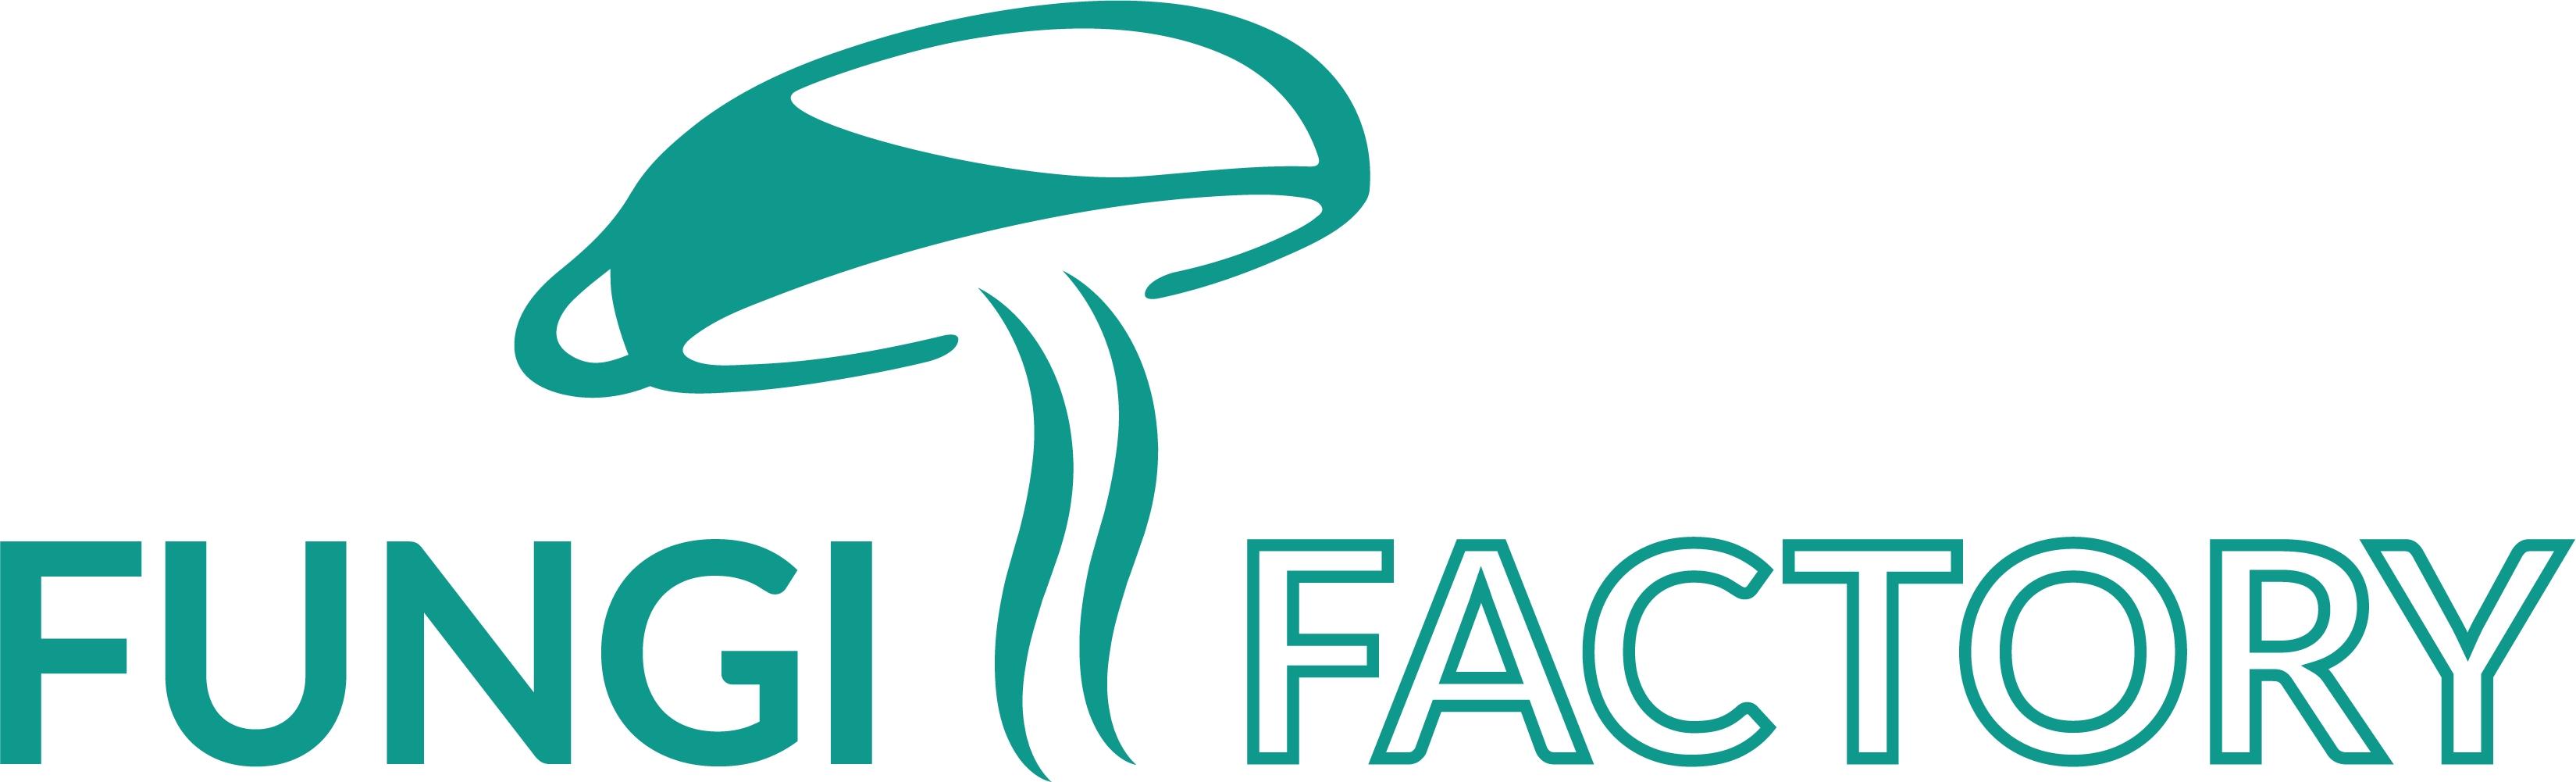 Fungi Factory logo